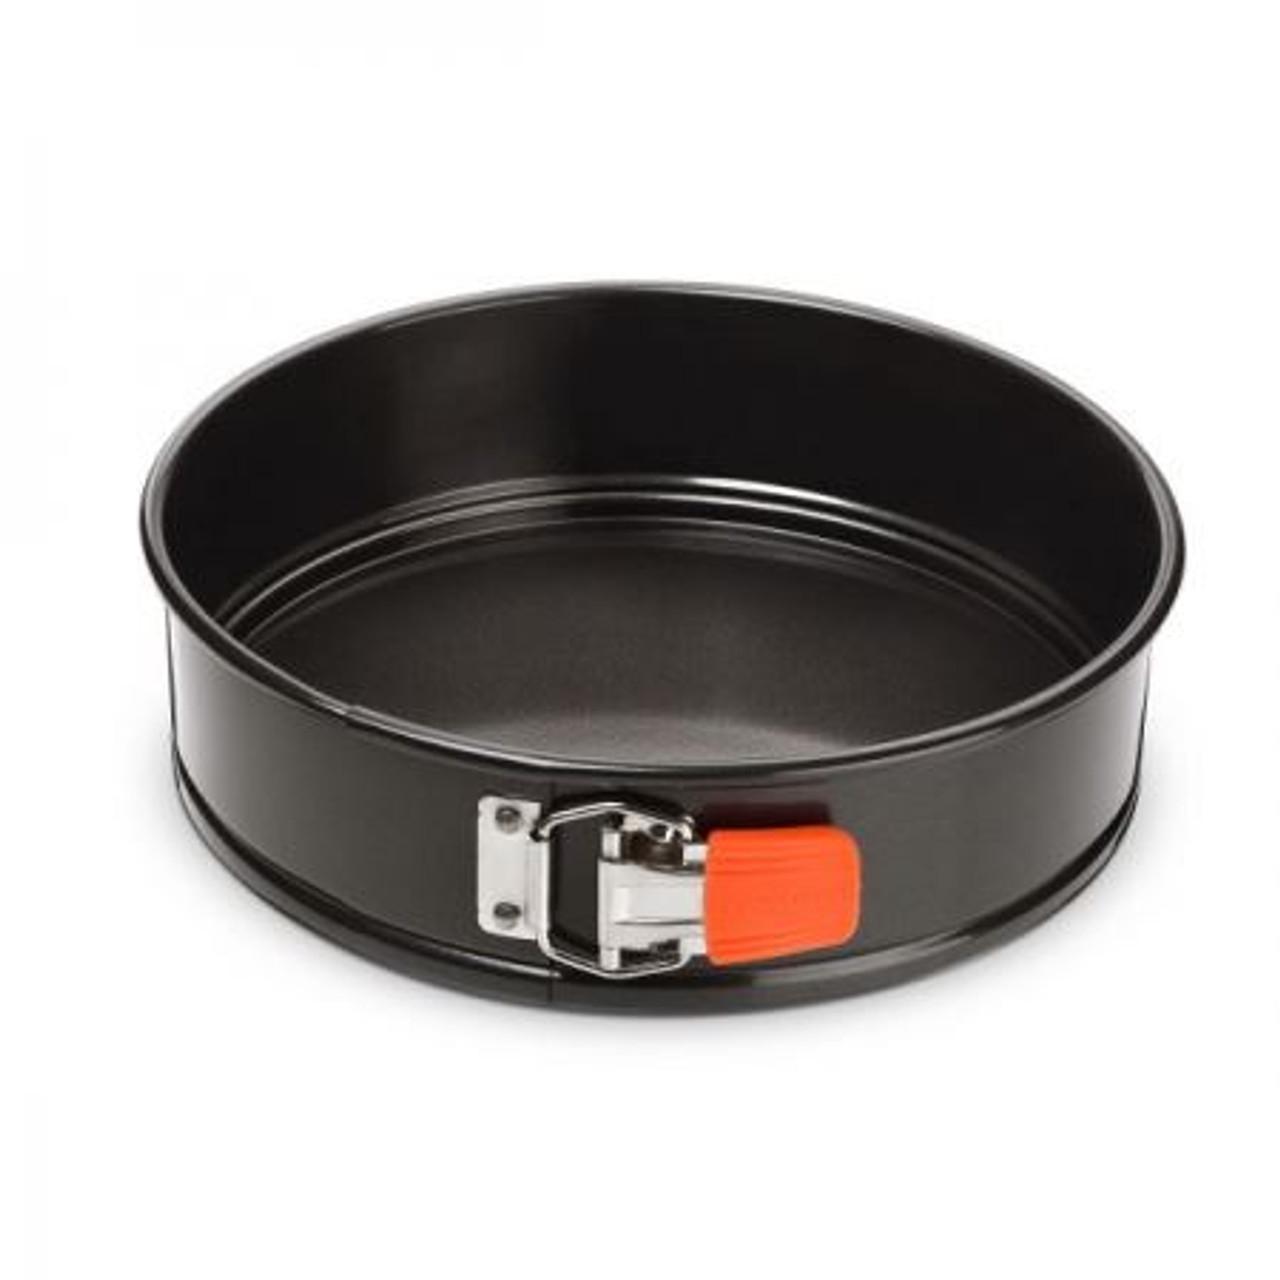 Le Creuset Toughened Non-stick 24cm Springform Round Cake Tin